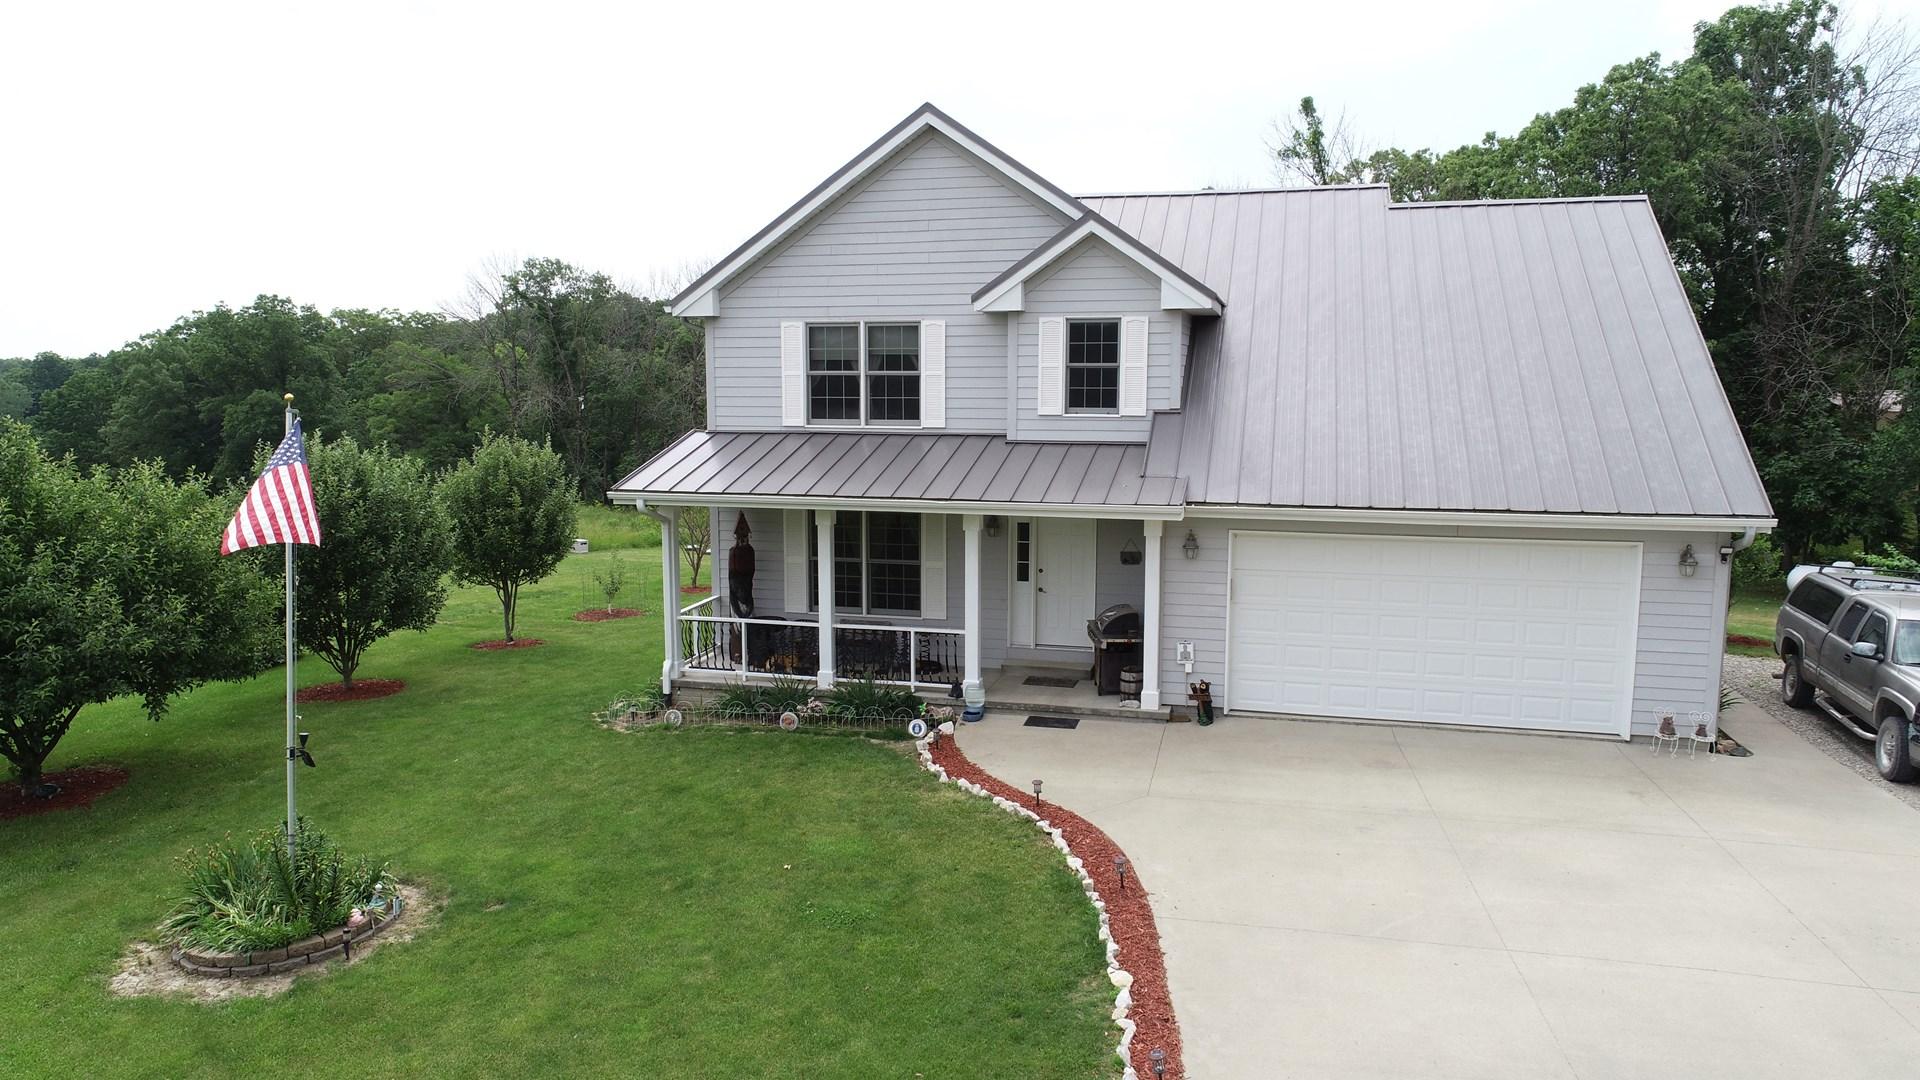 Monroe County Rural Acreage for Sale